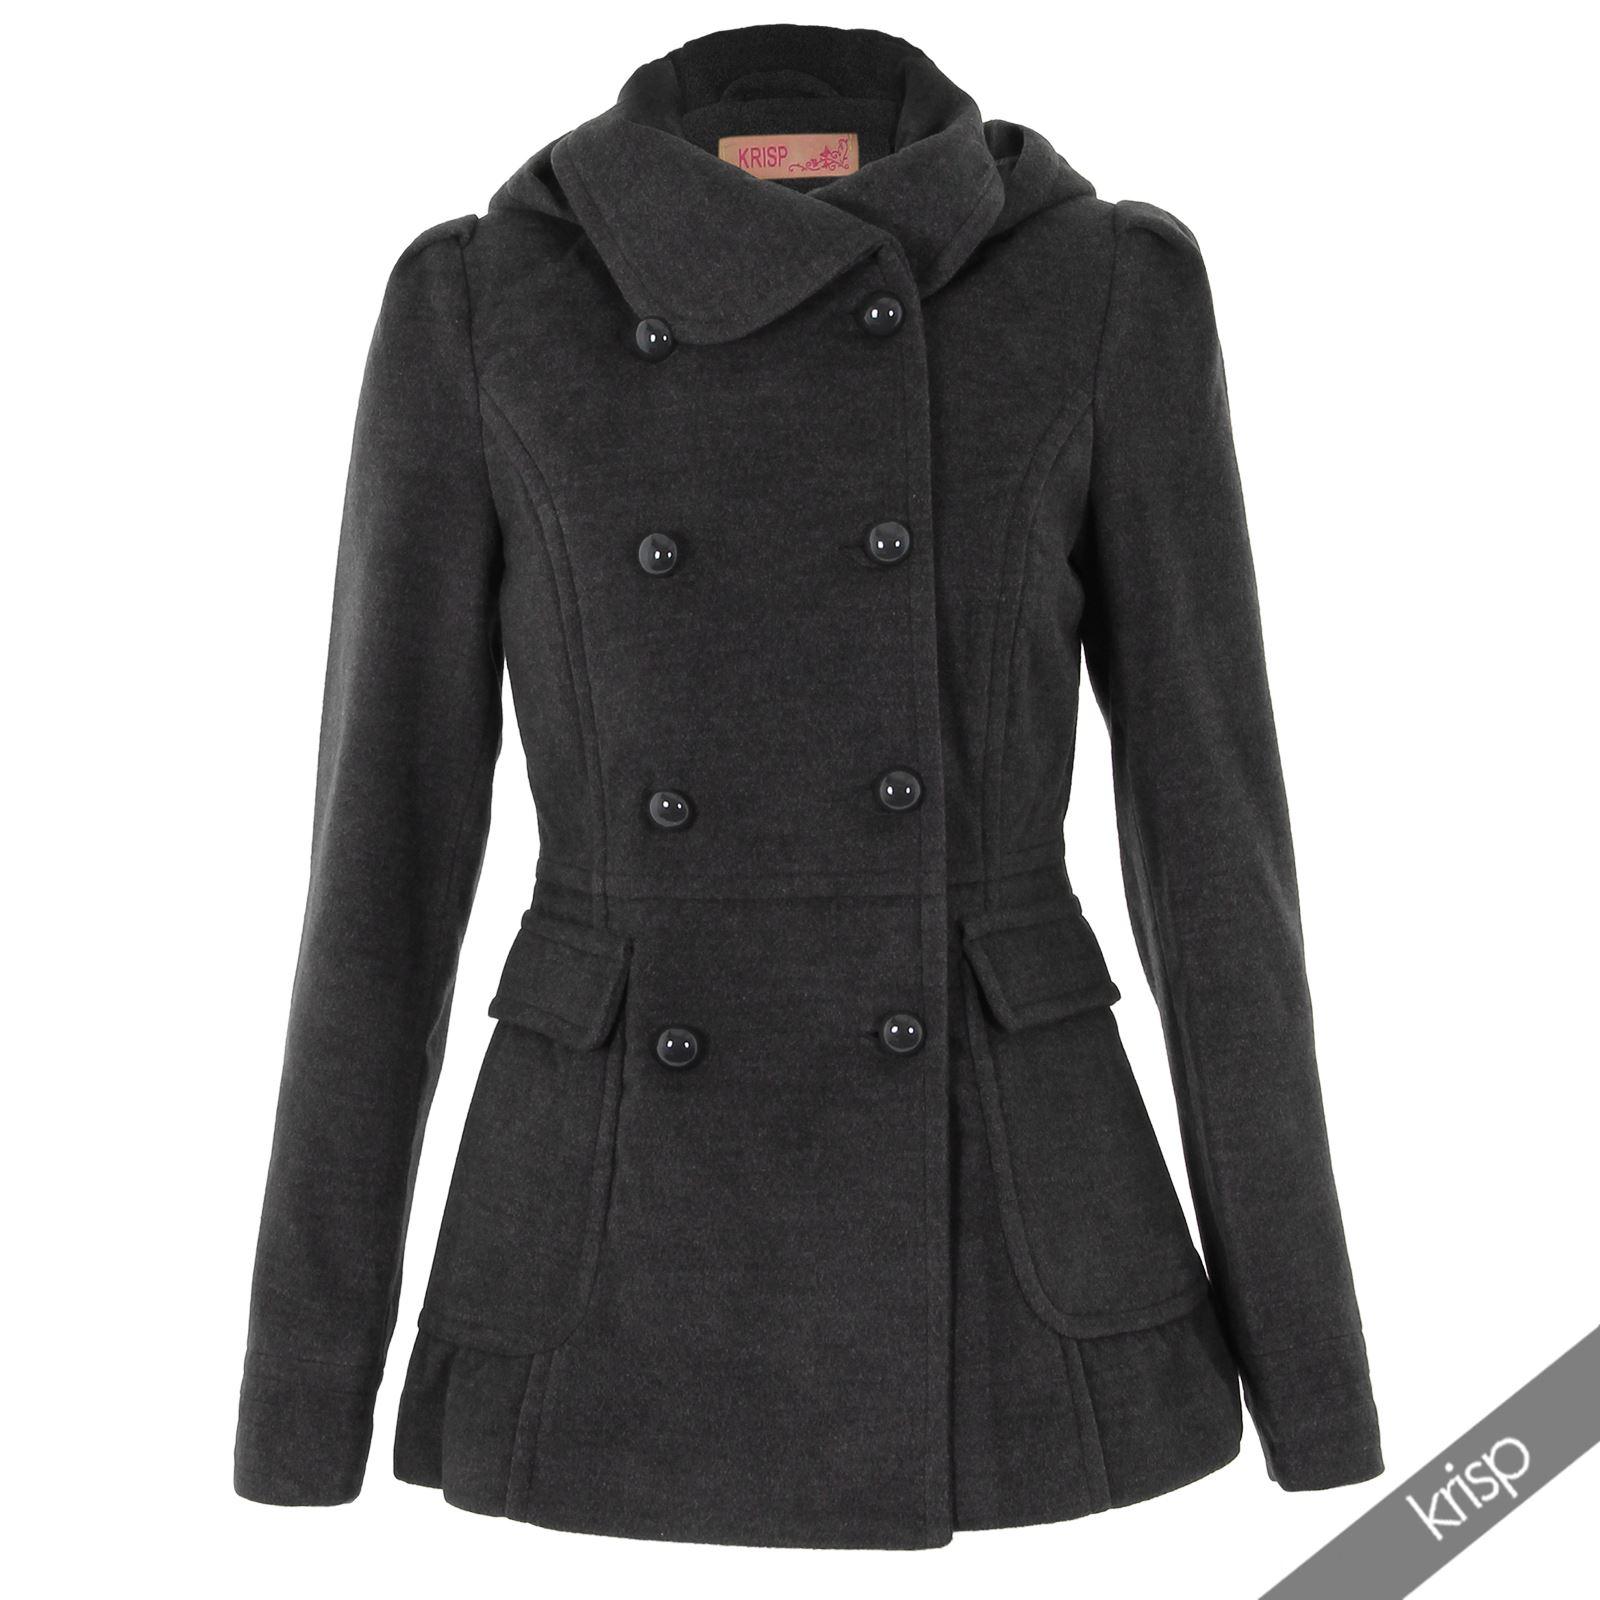 Ebay womens jacket